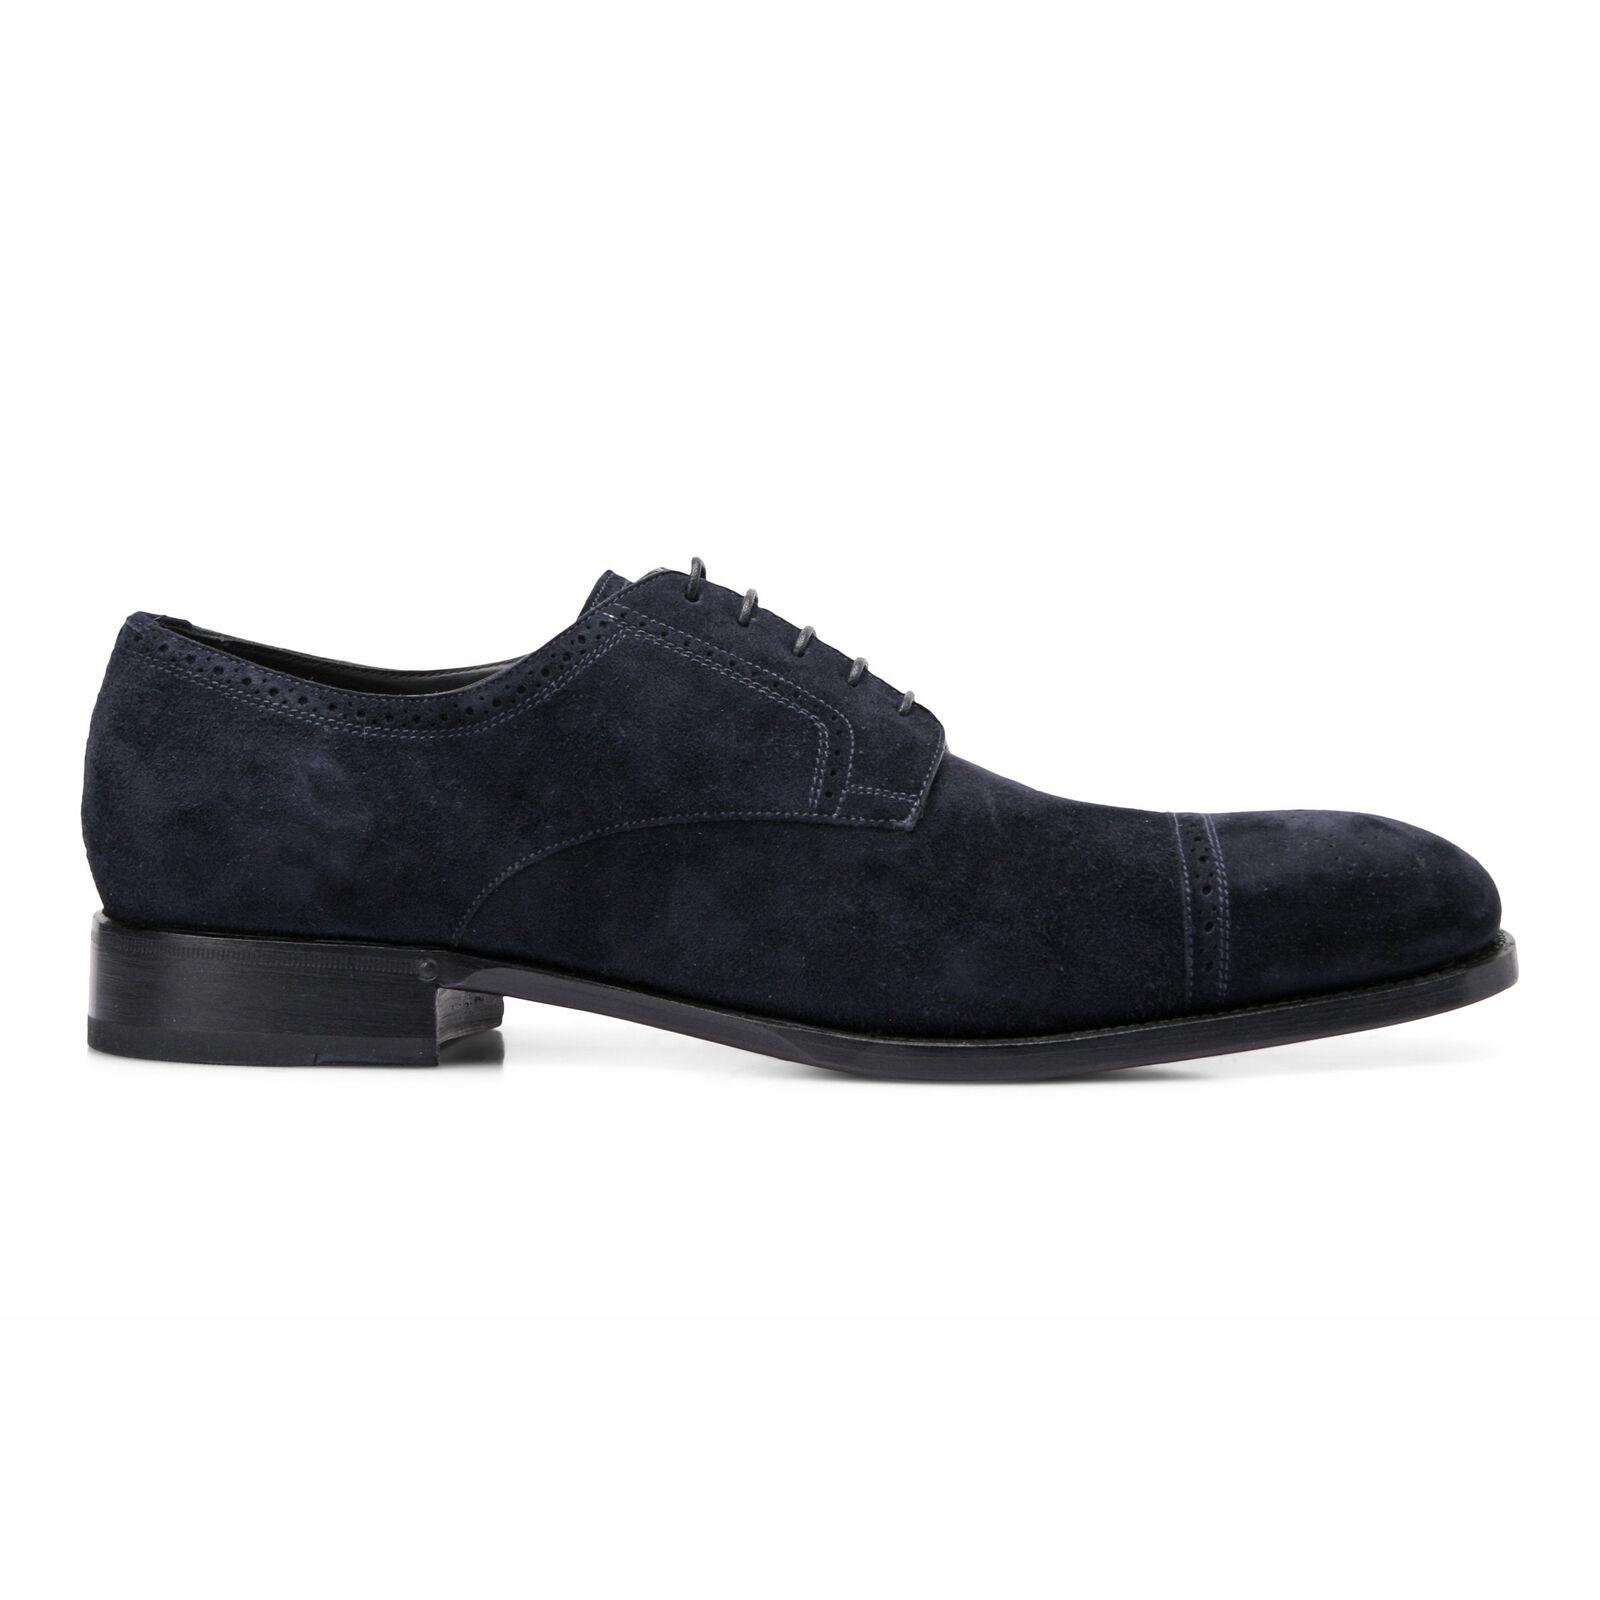 Brioni Hombre ante blue Marino Zapato de Vestir Eu 42 Eu 9 Nuevo